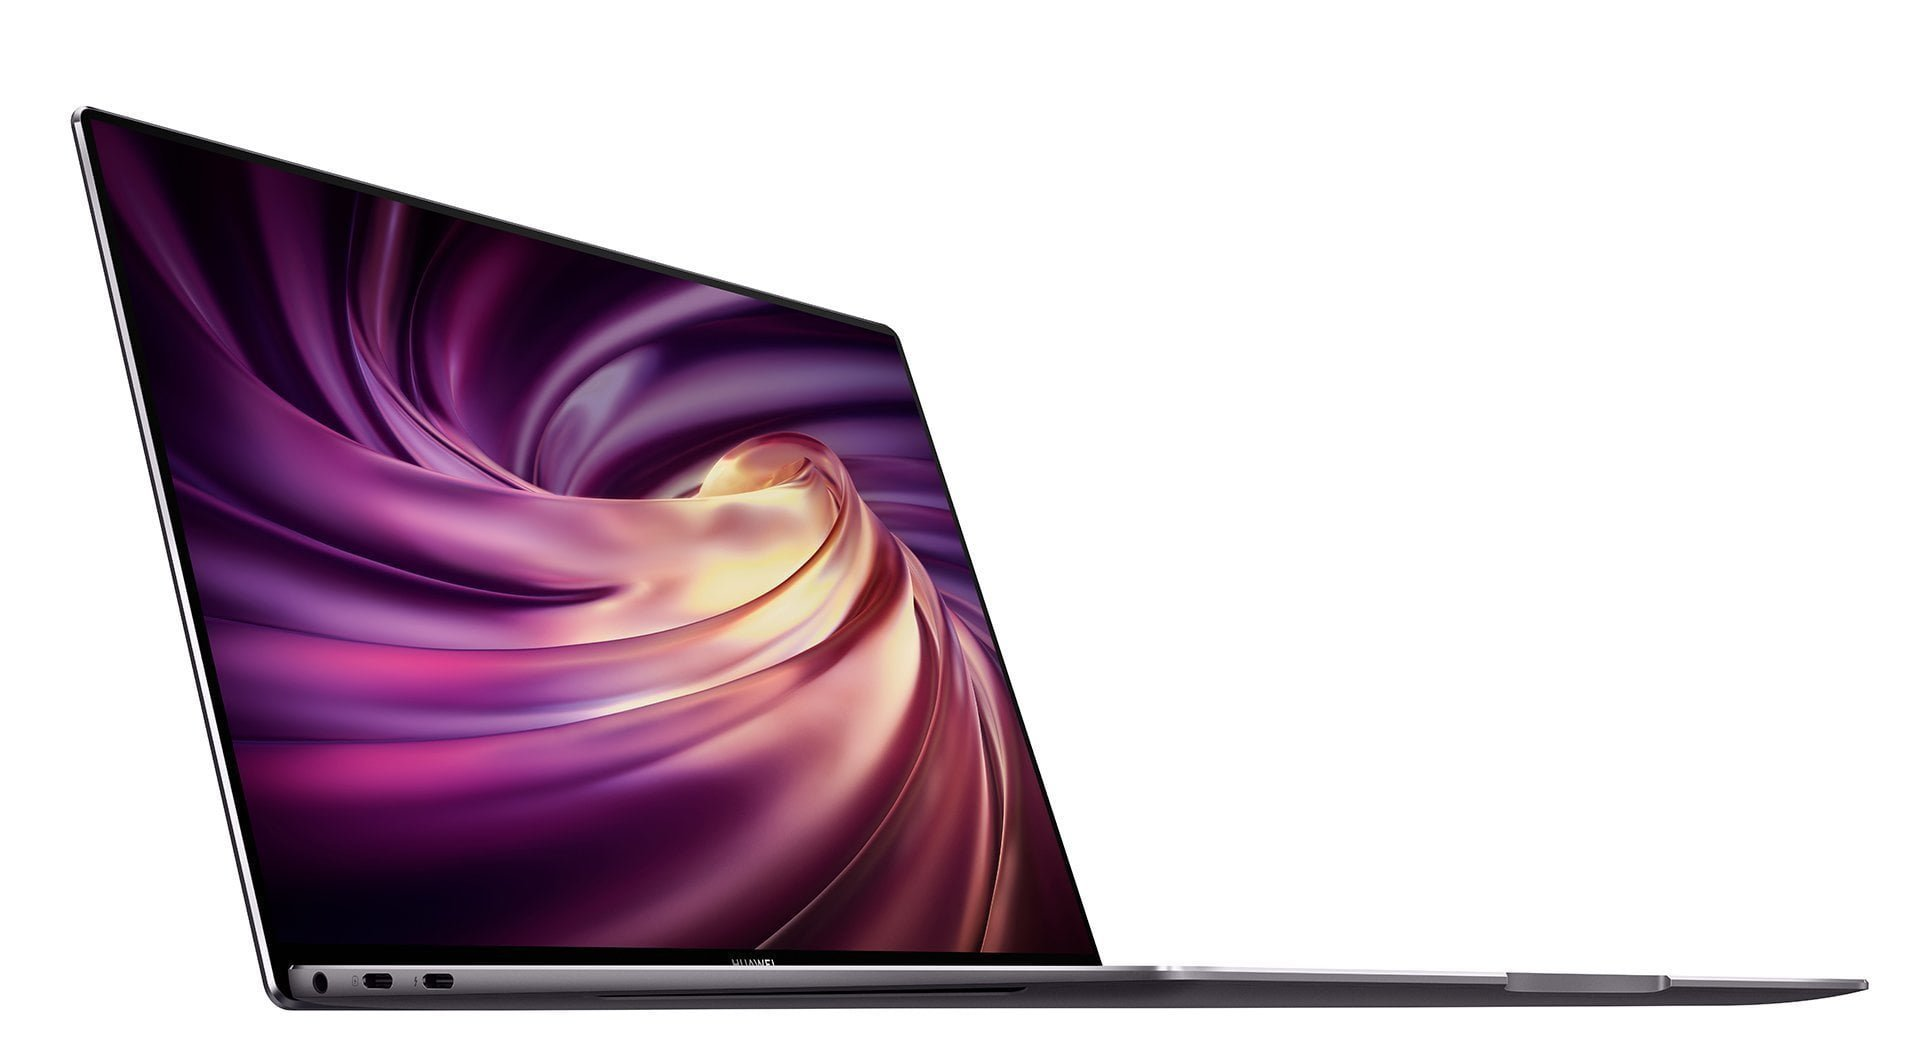 MWC 2019: drei neue Huawei MateBooks angekündigt 3